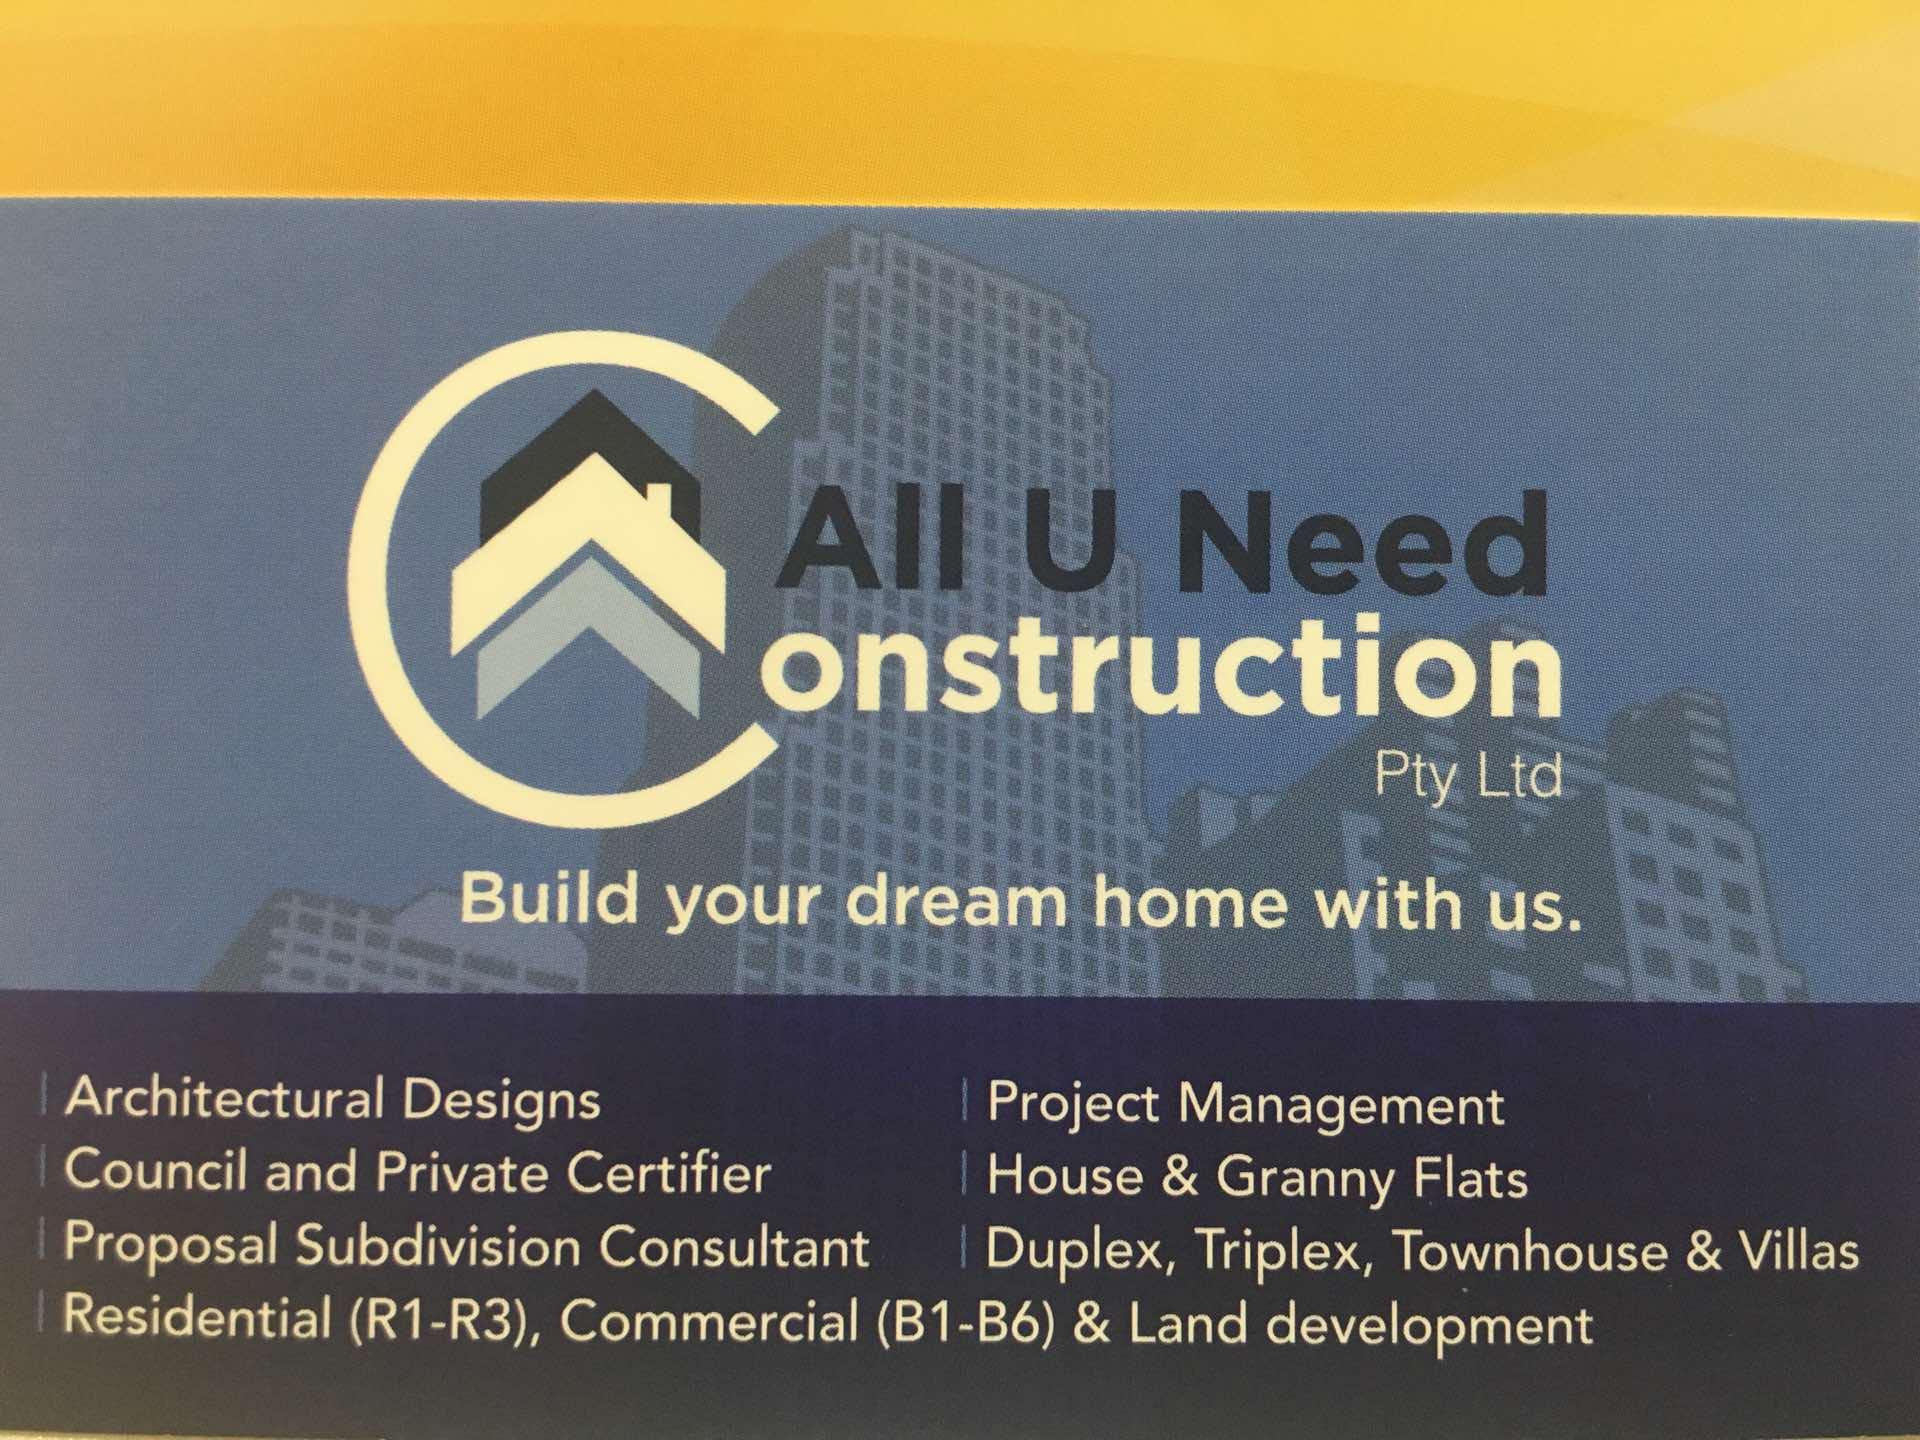 All U Need Construction - Ali Hunardost - 1 project